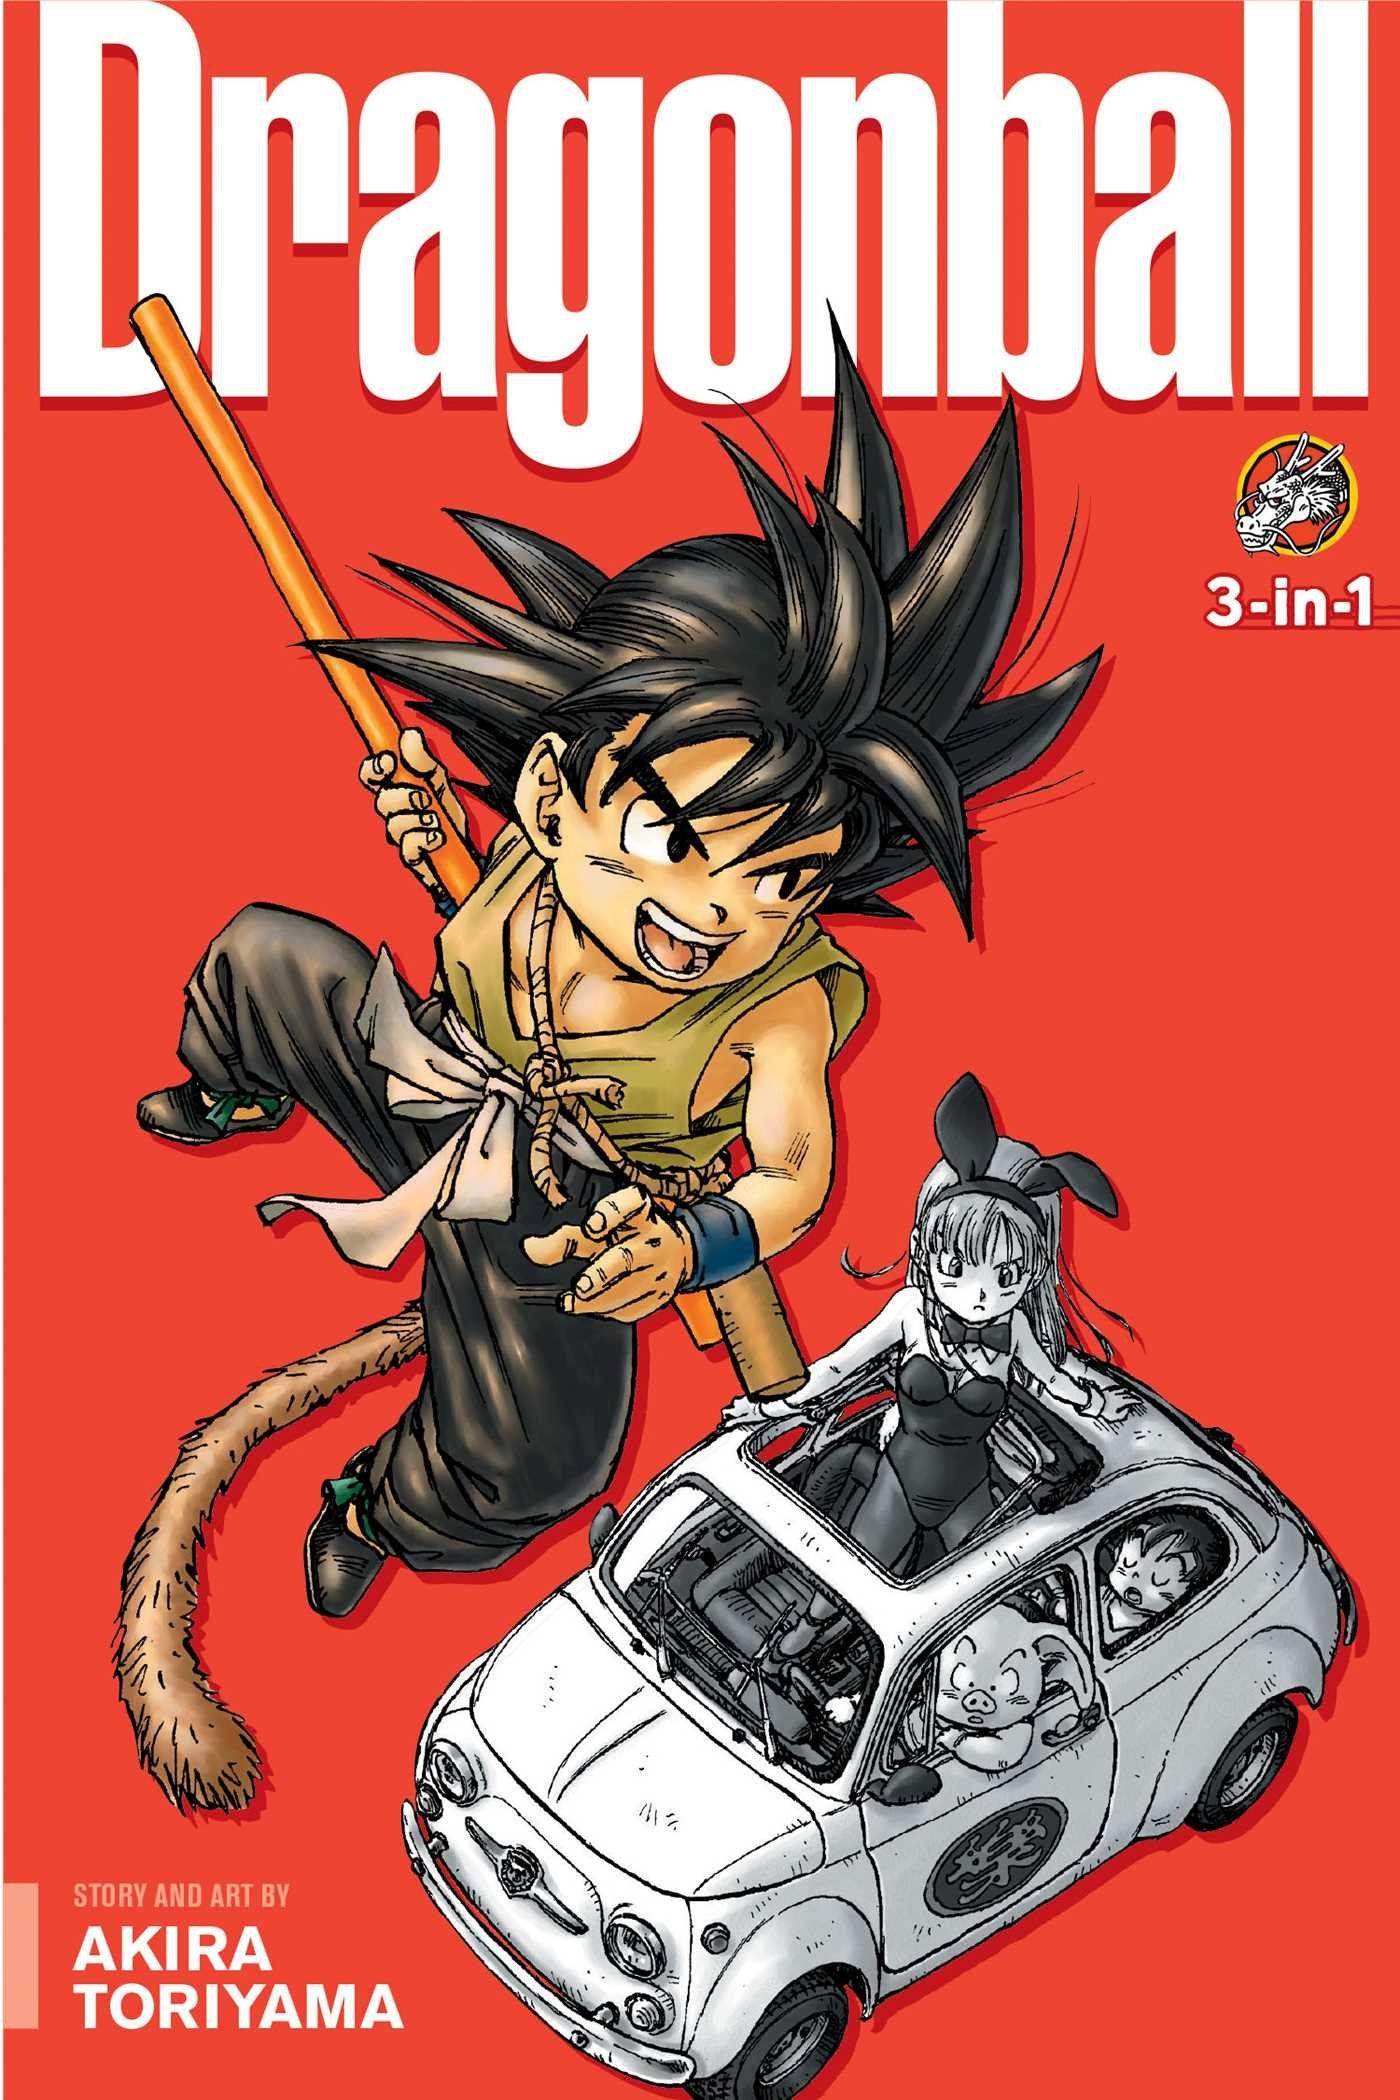 Dragon Ball 3 In 1 Edition Vol 1 Includes Vols 1 2 3 1 Toriyama Akira 9781421555645 Amazon Com Books